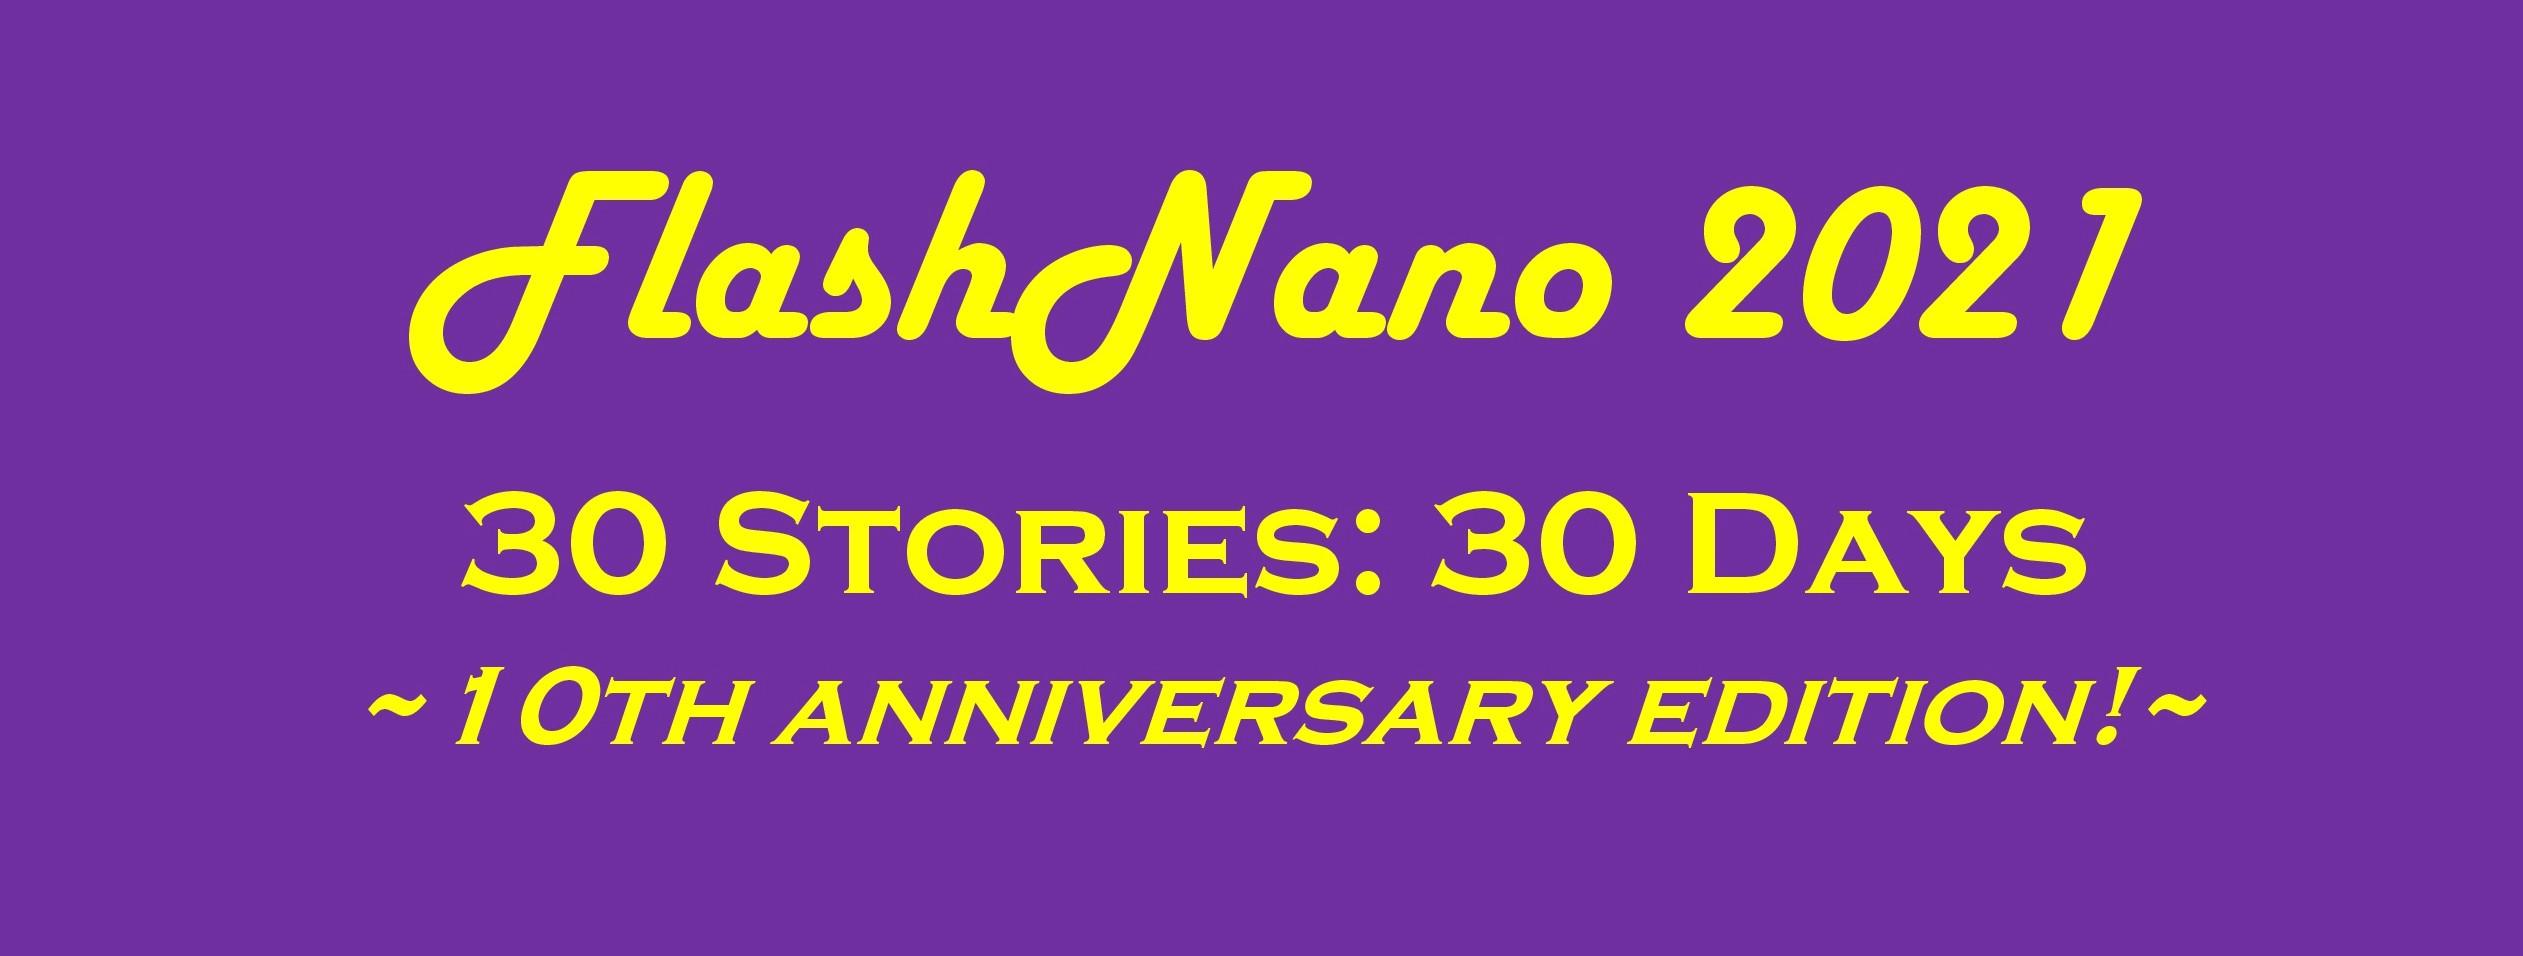 flashnano-2021-cropped